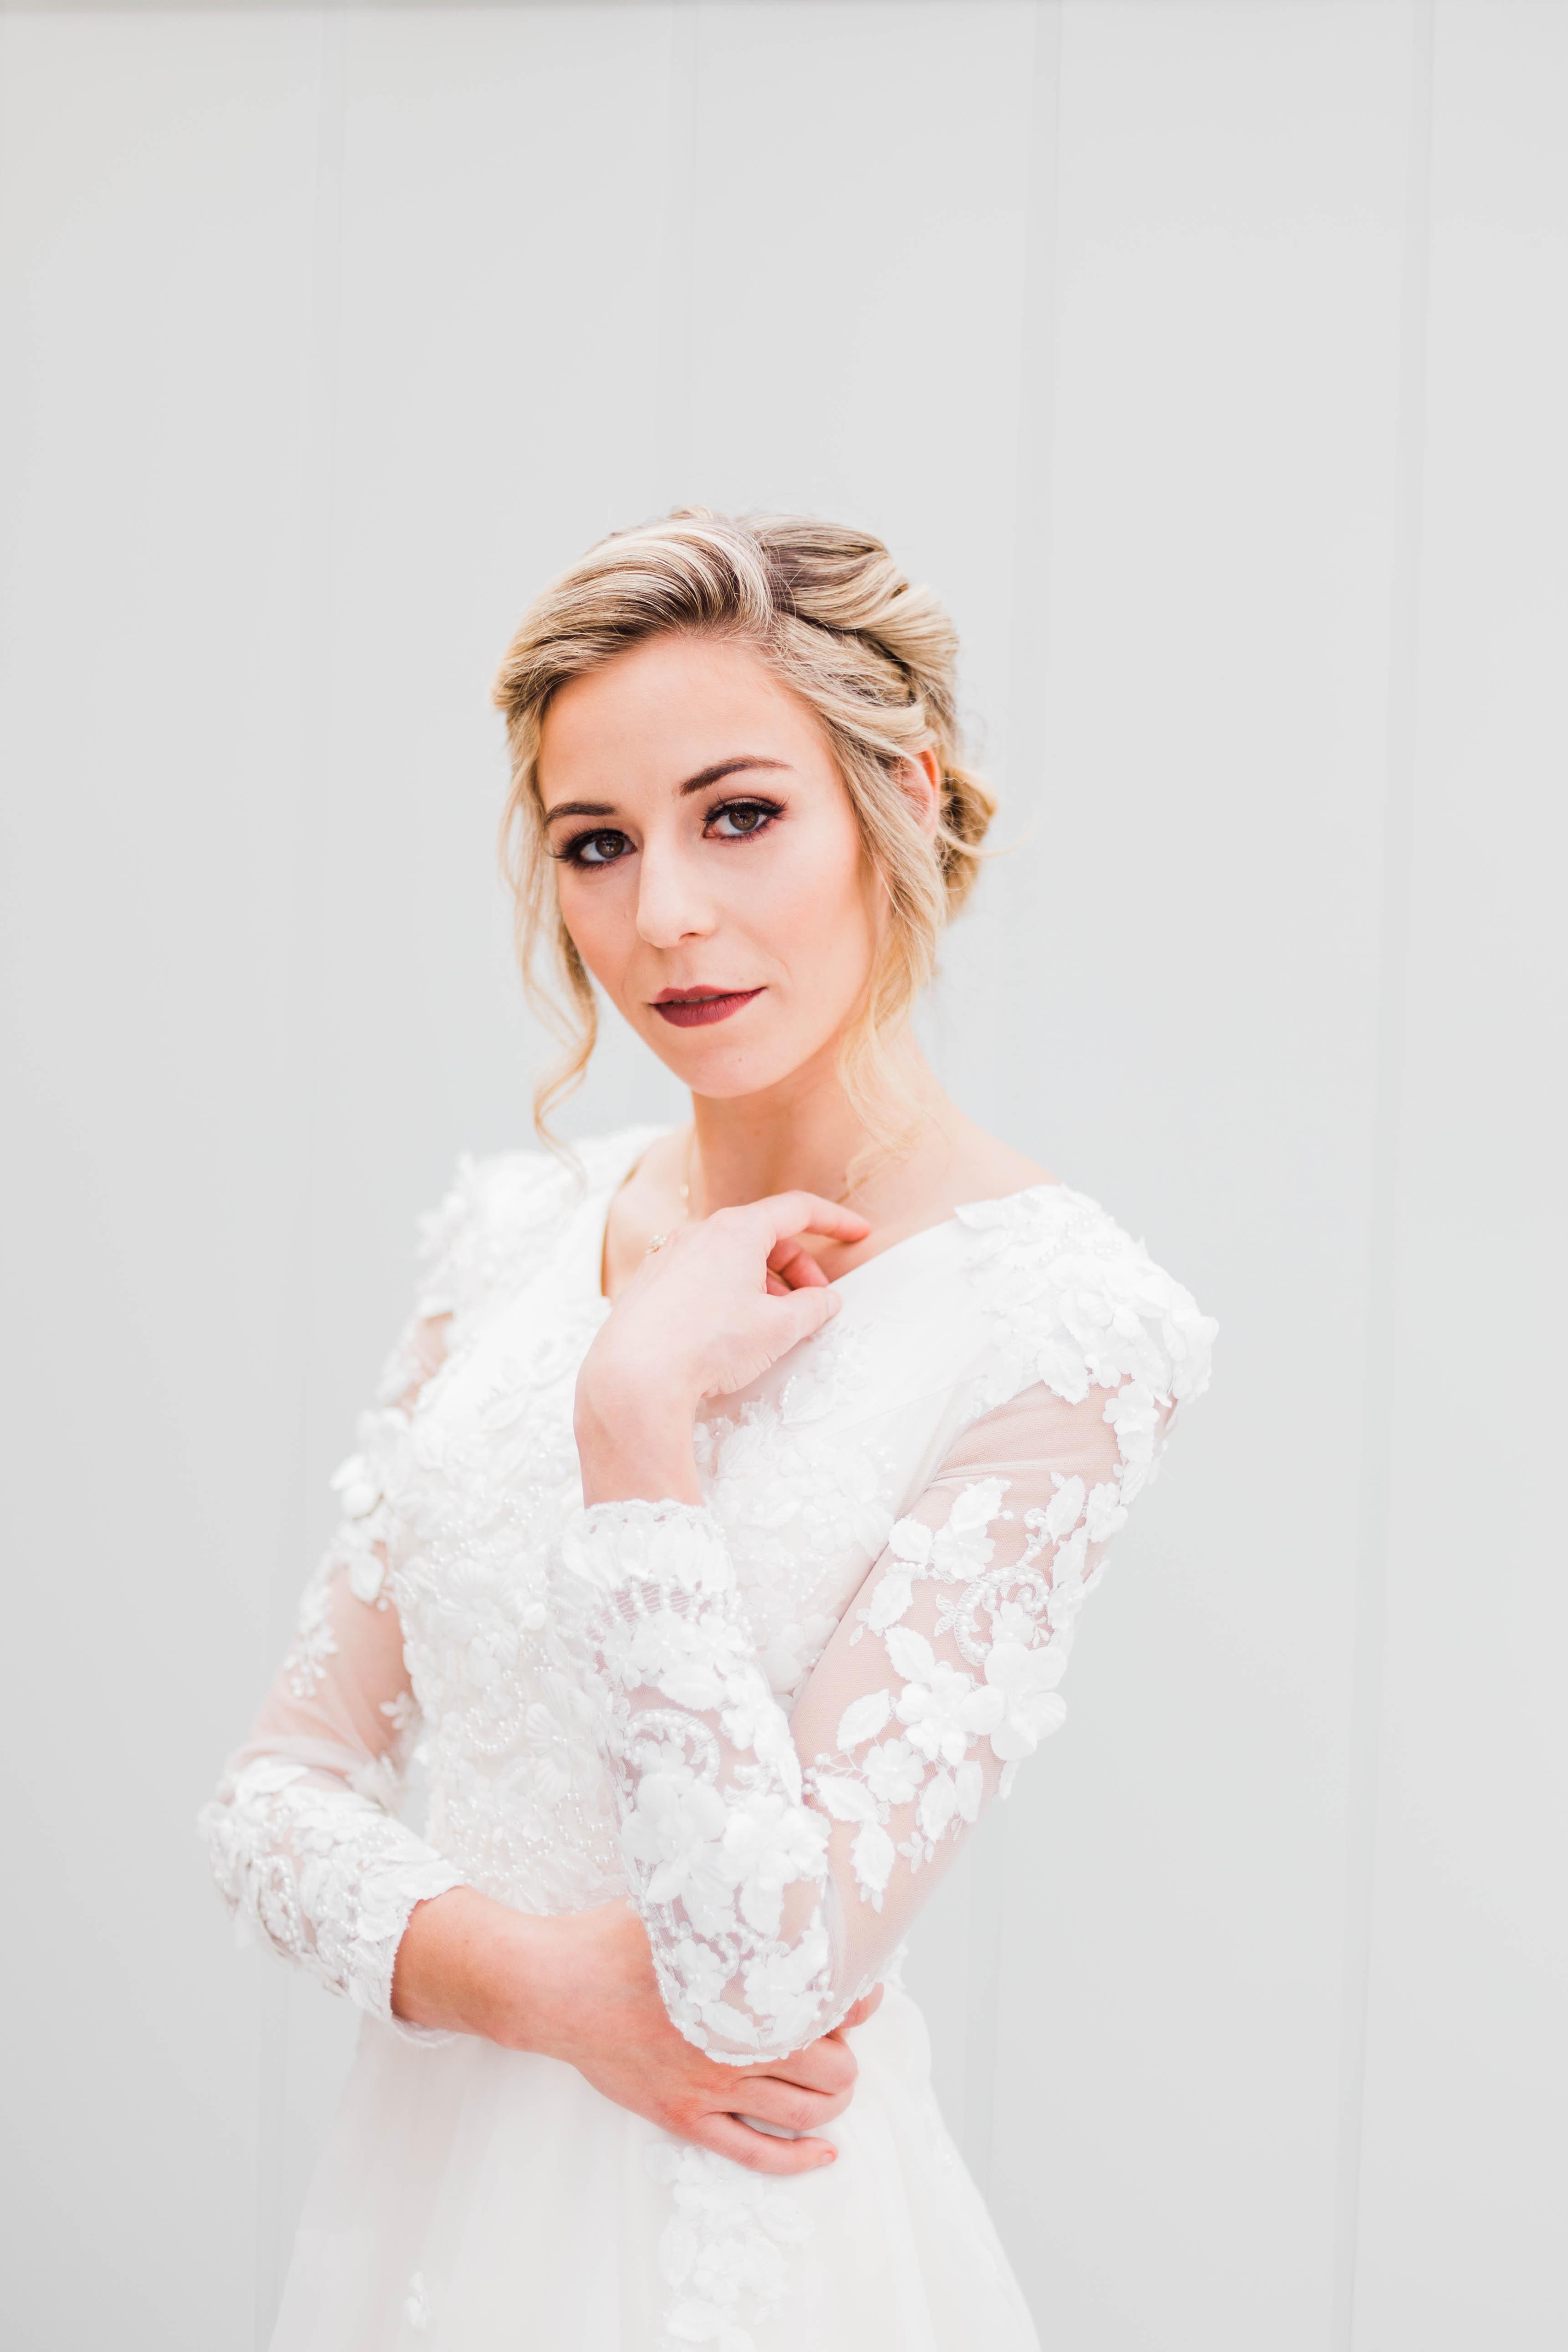 Utah wedding hair and makeup artist